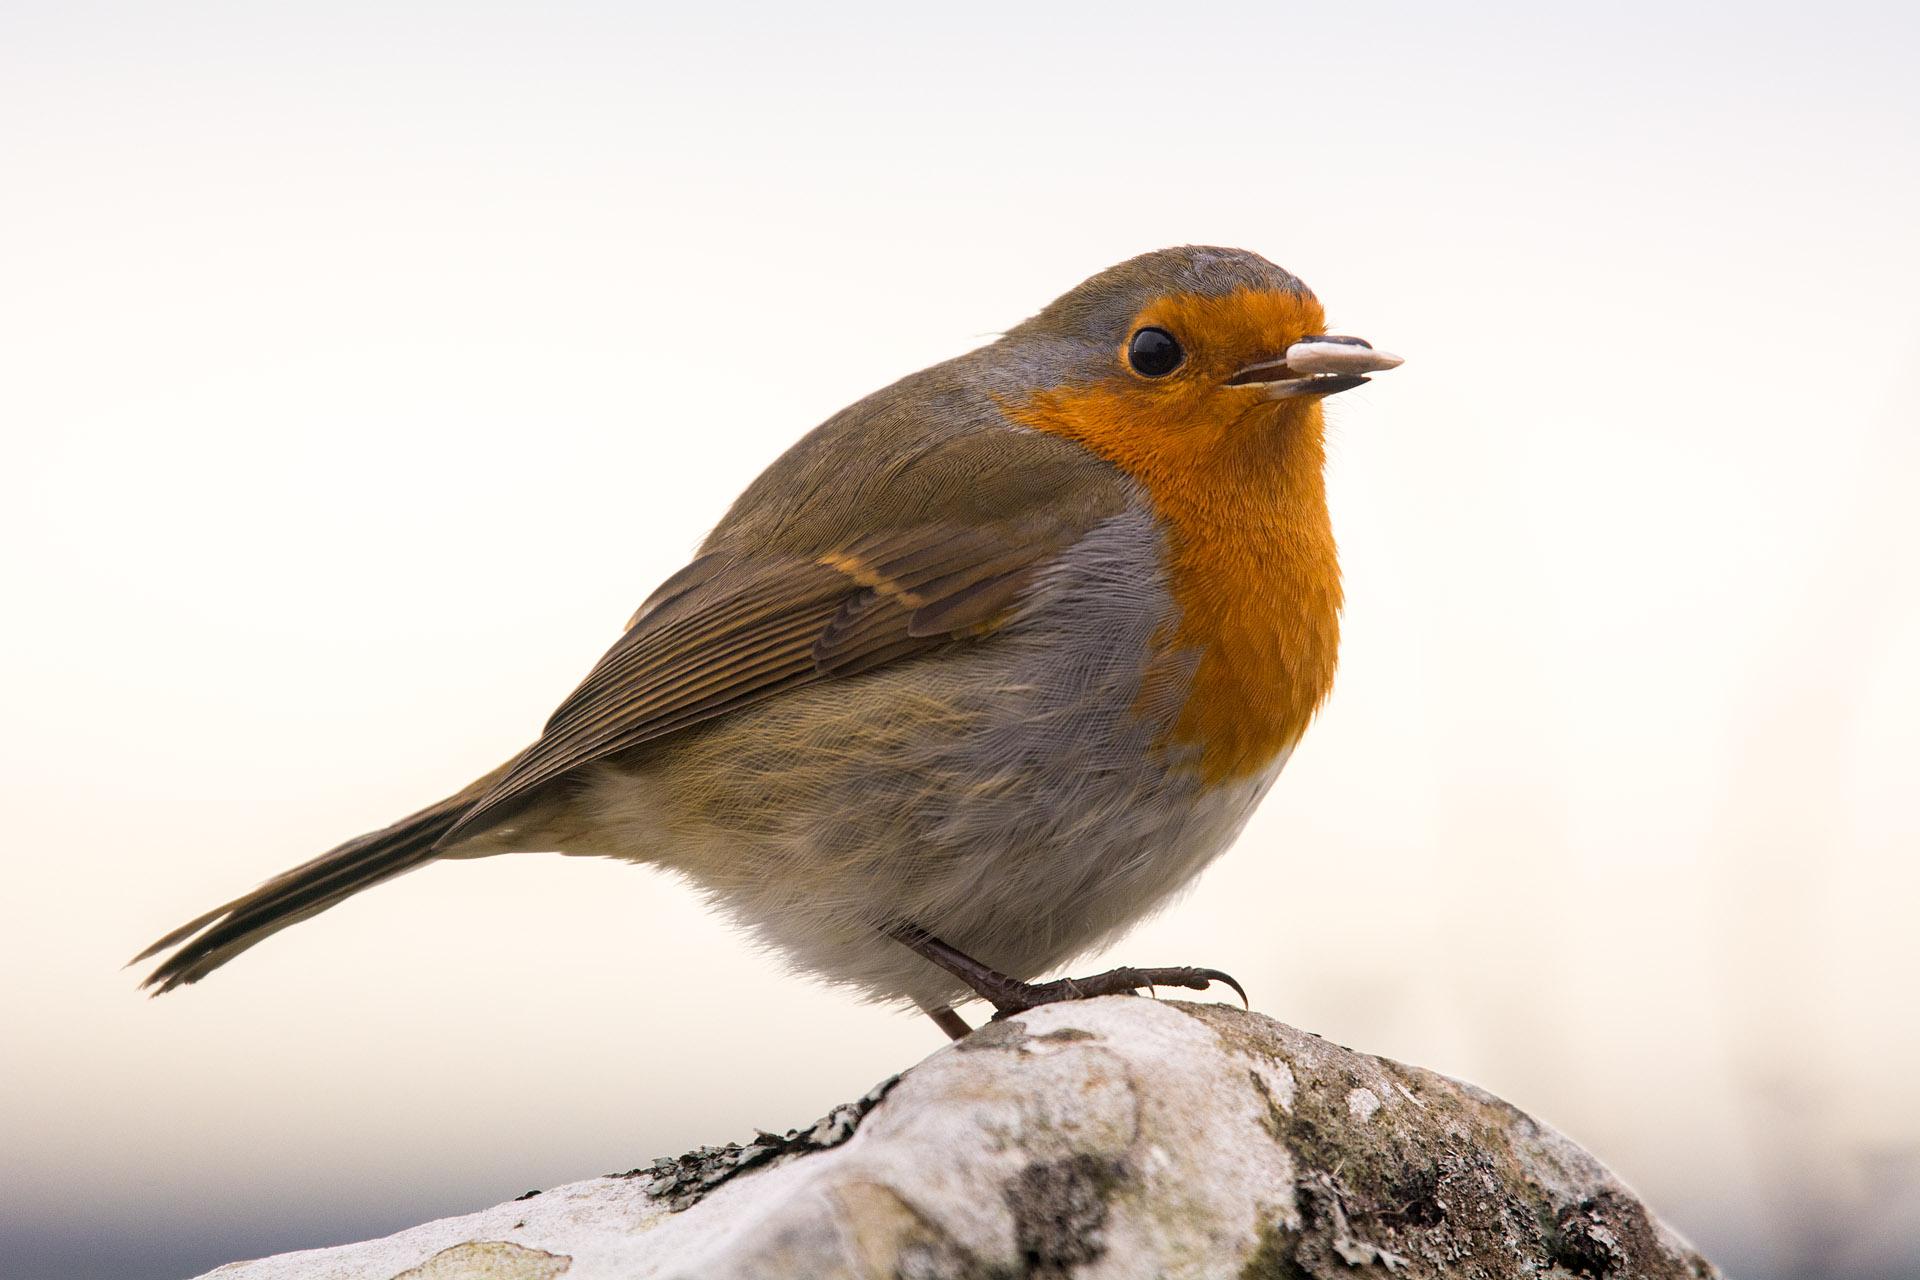 Hadrian's robin